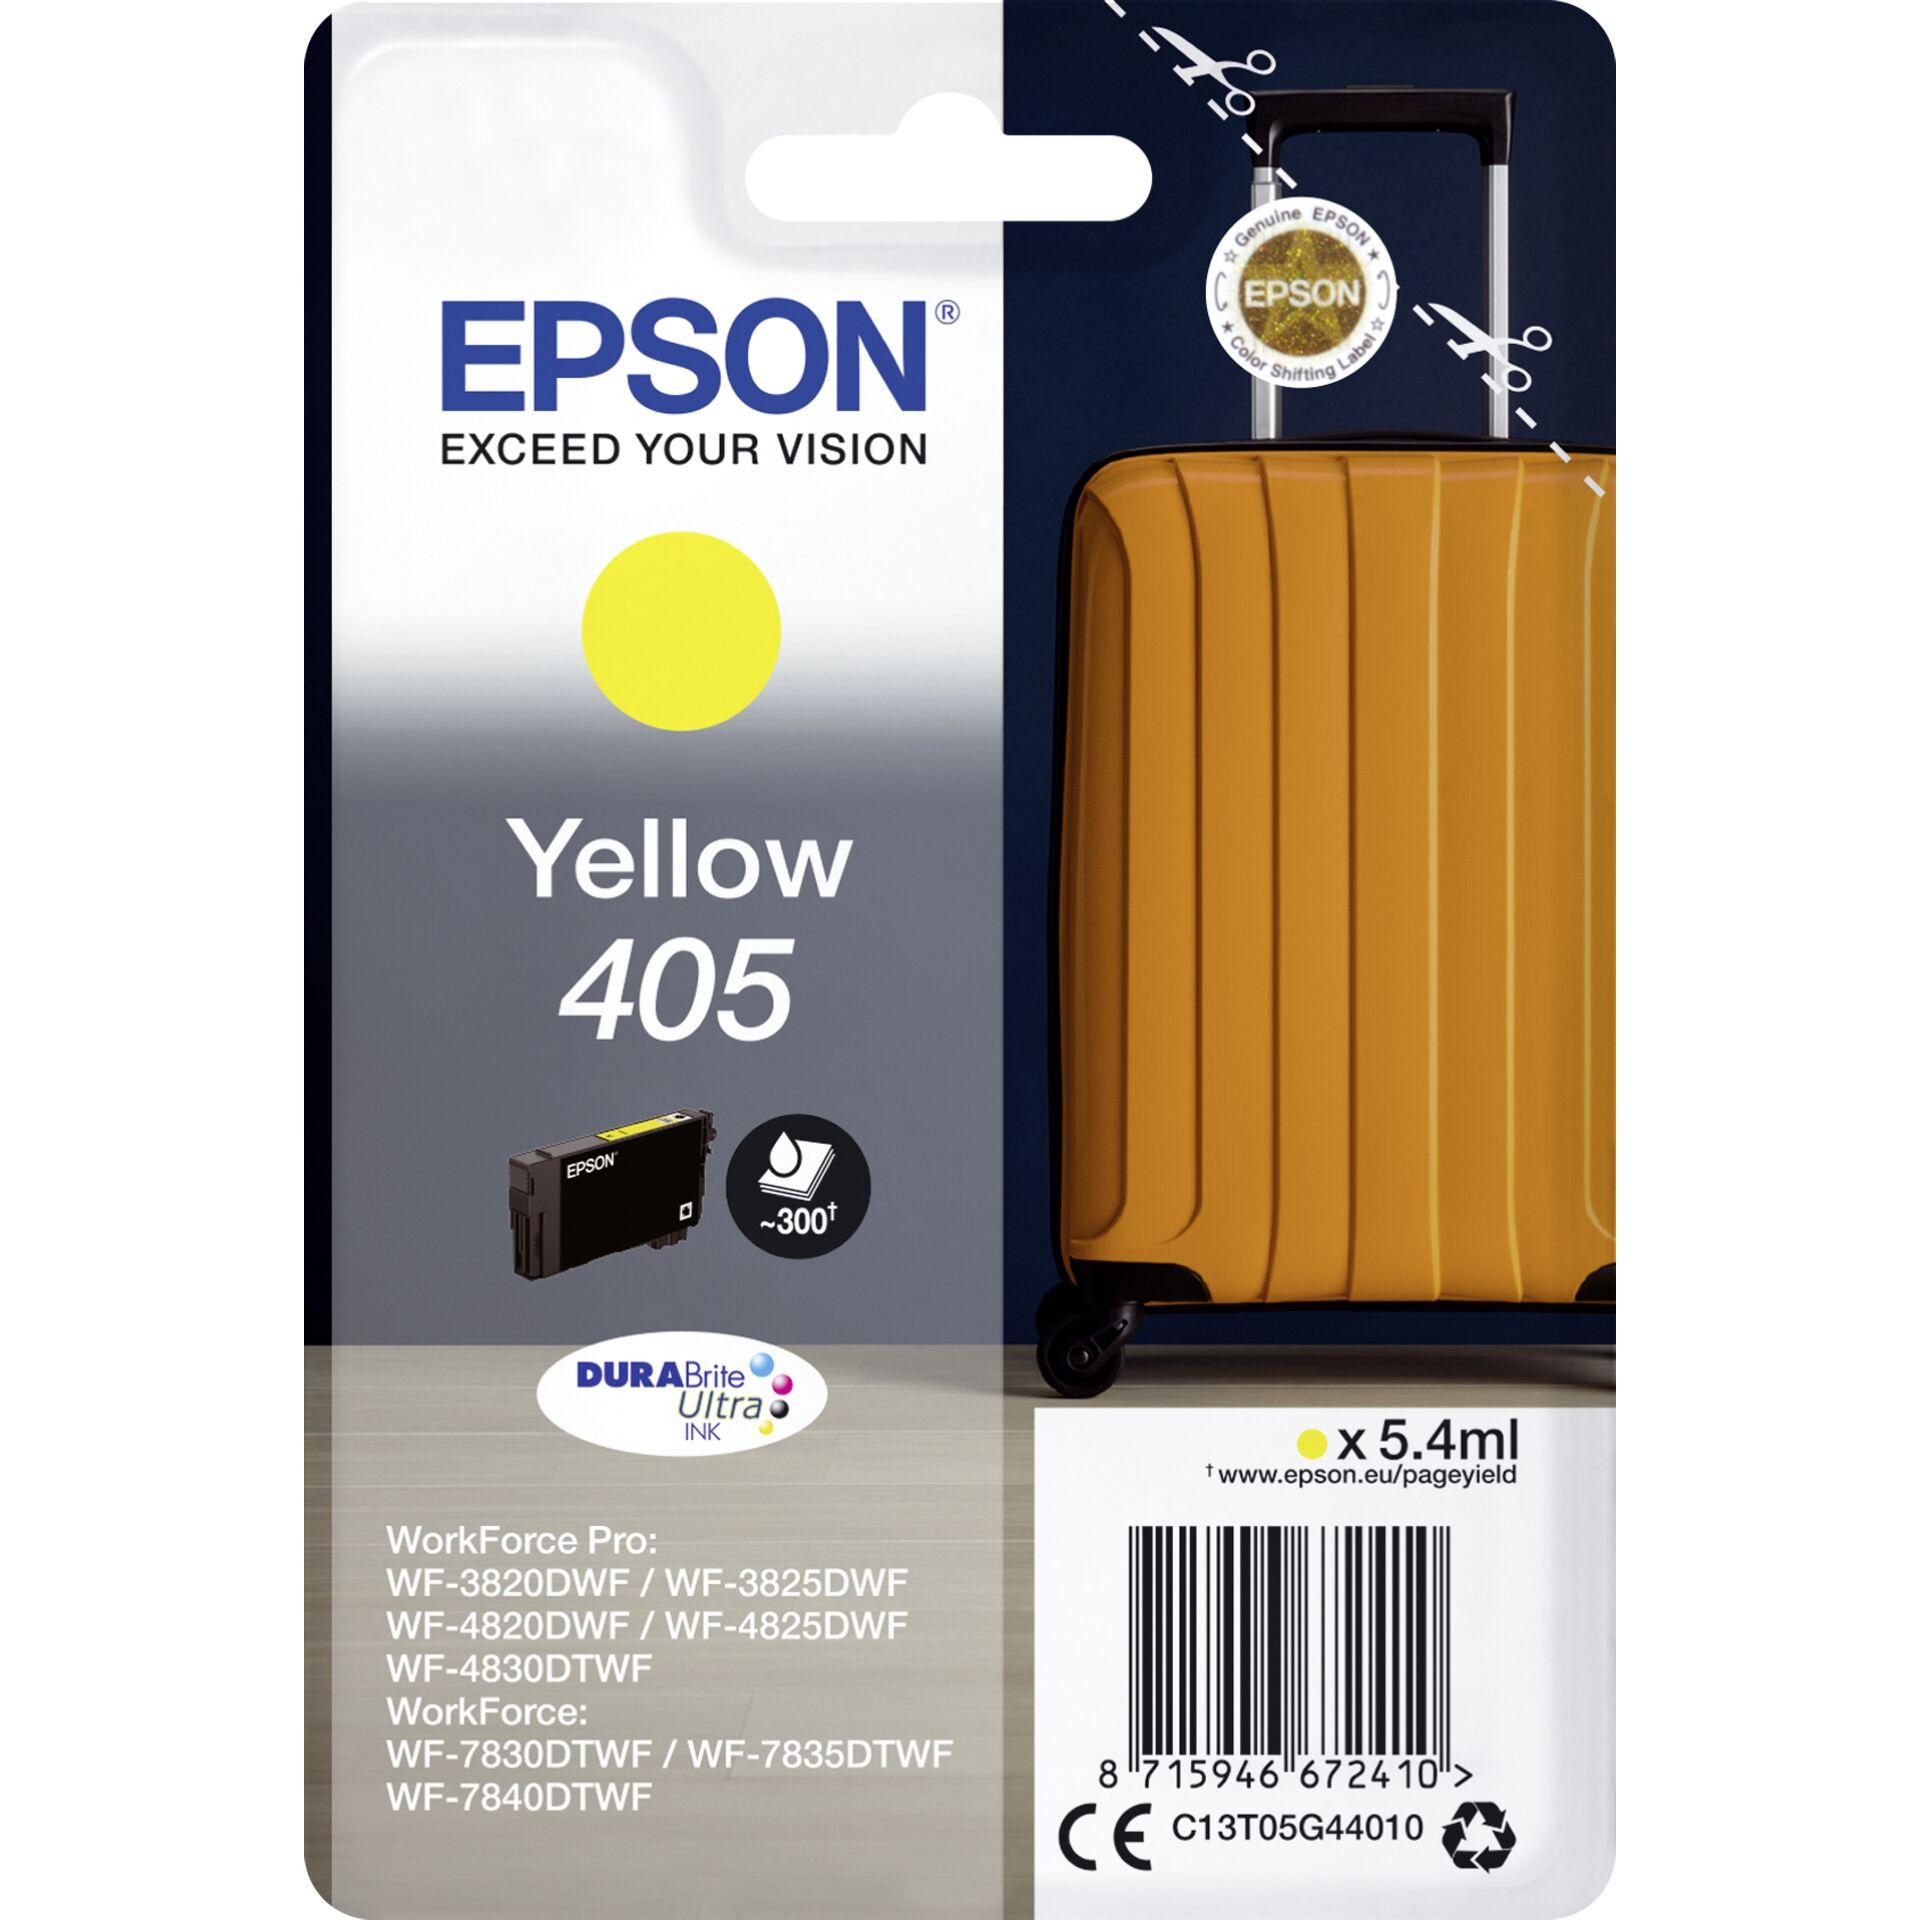 Epson Cartridge T05G4 DURABrite Ultra yellow->Μελάνια - www.katerelos.gr